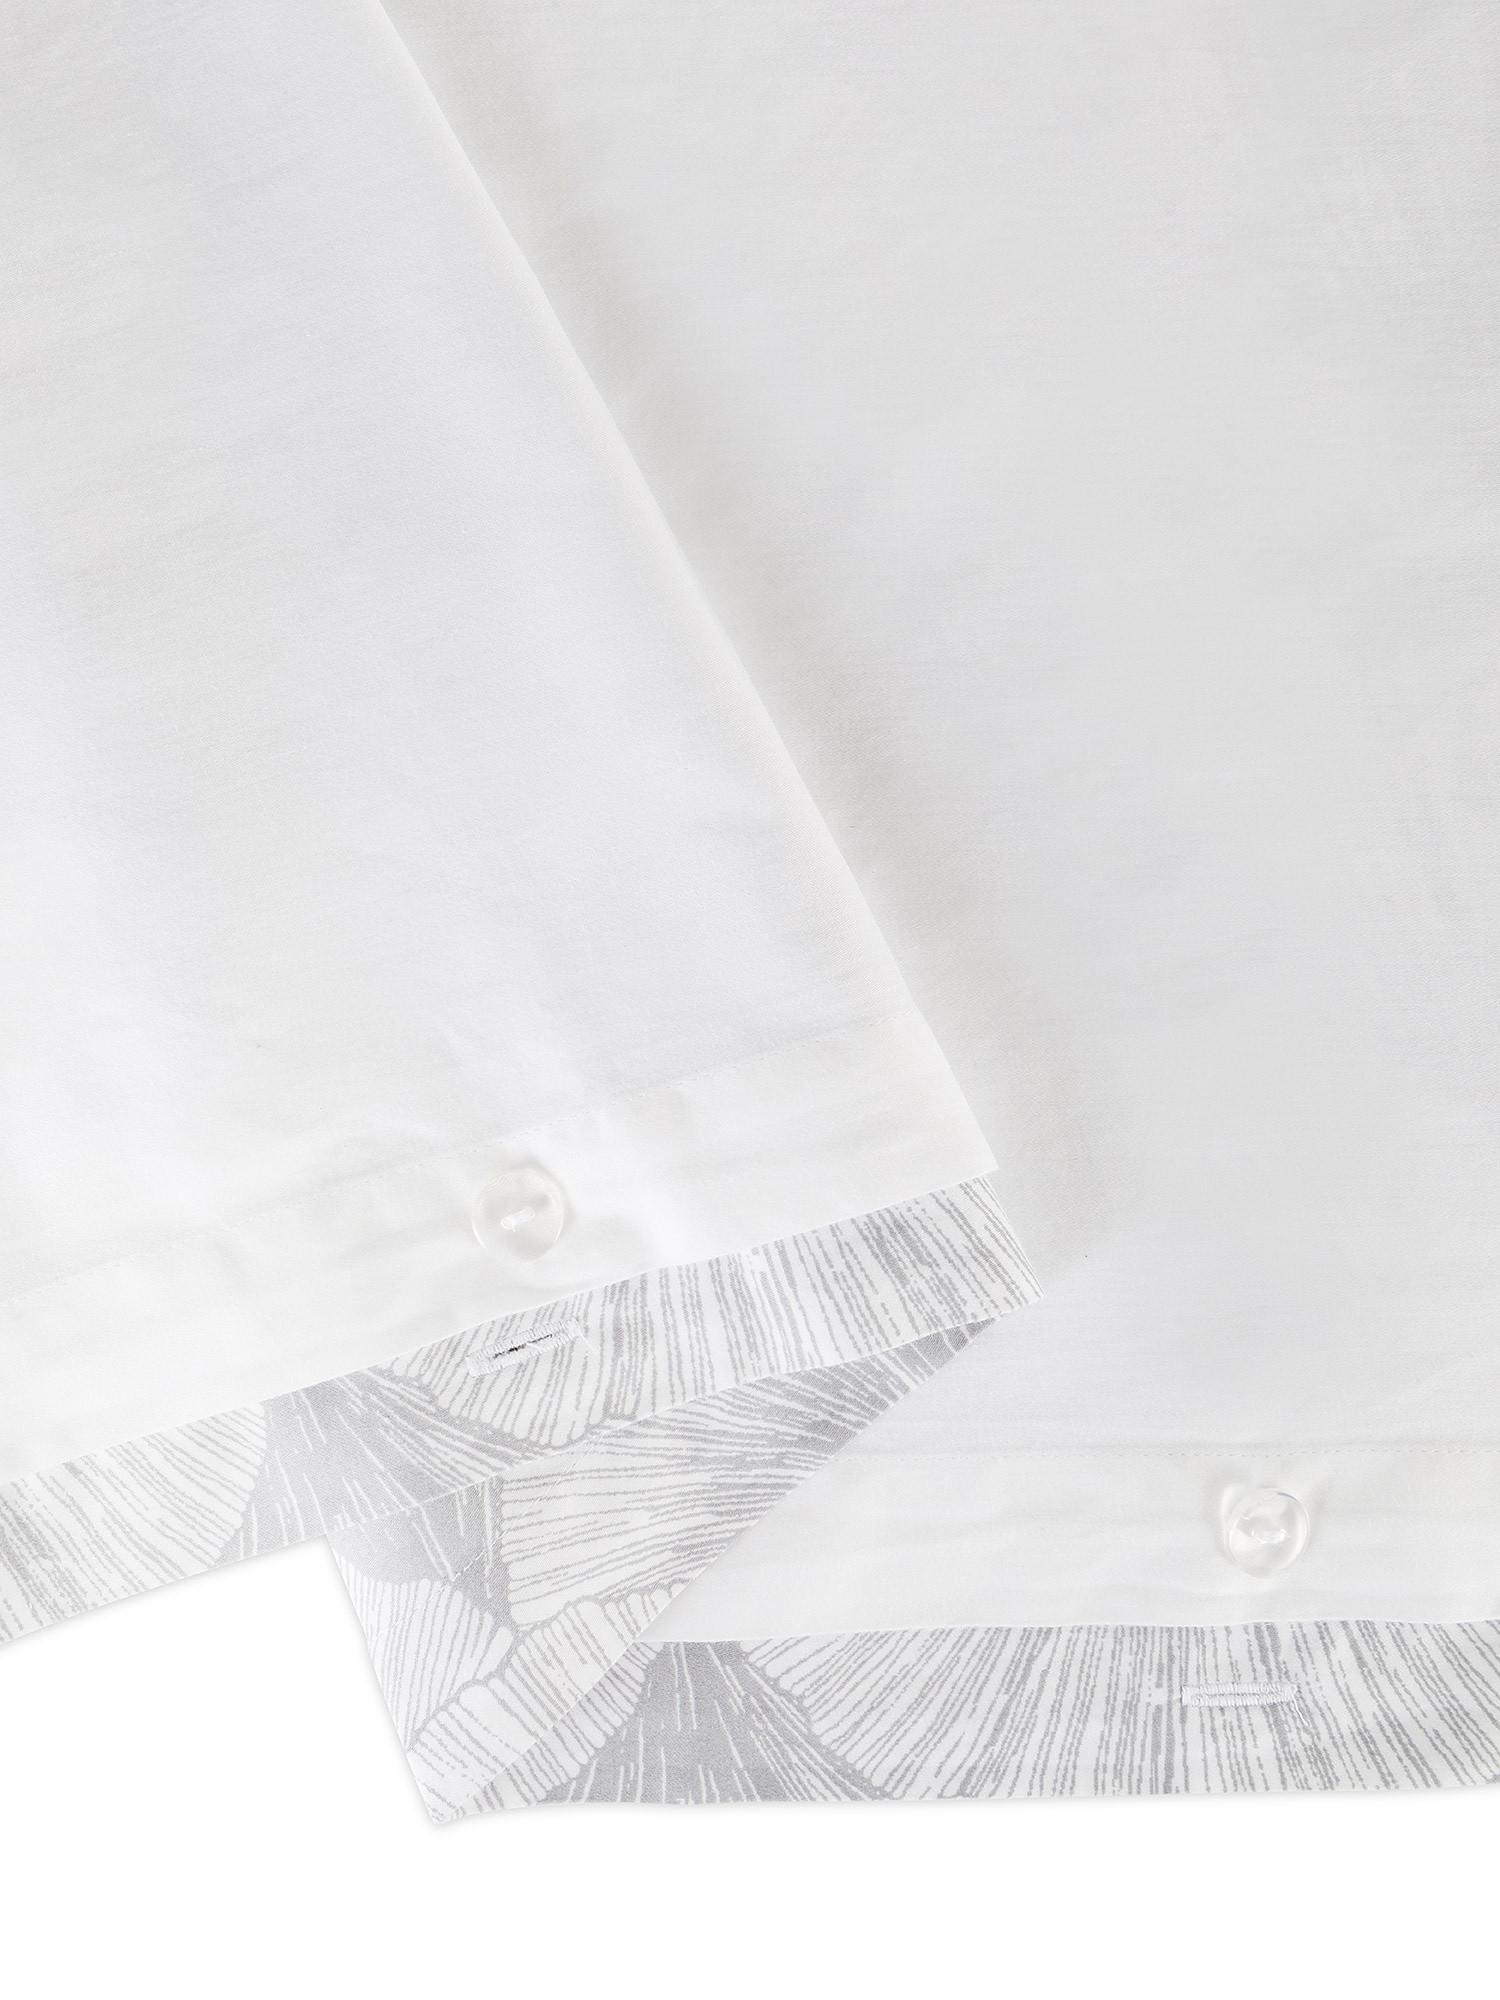 Copripiumino raso di cotone fantasia Ginkgo, Bianco, large image number 2